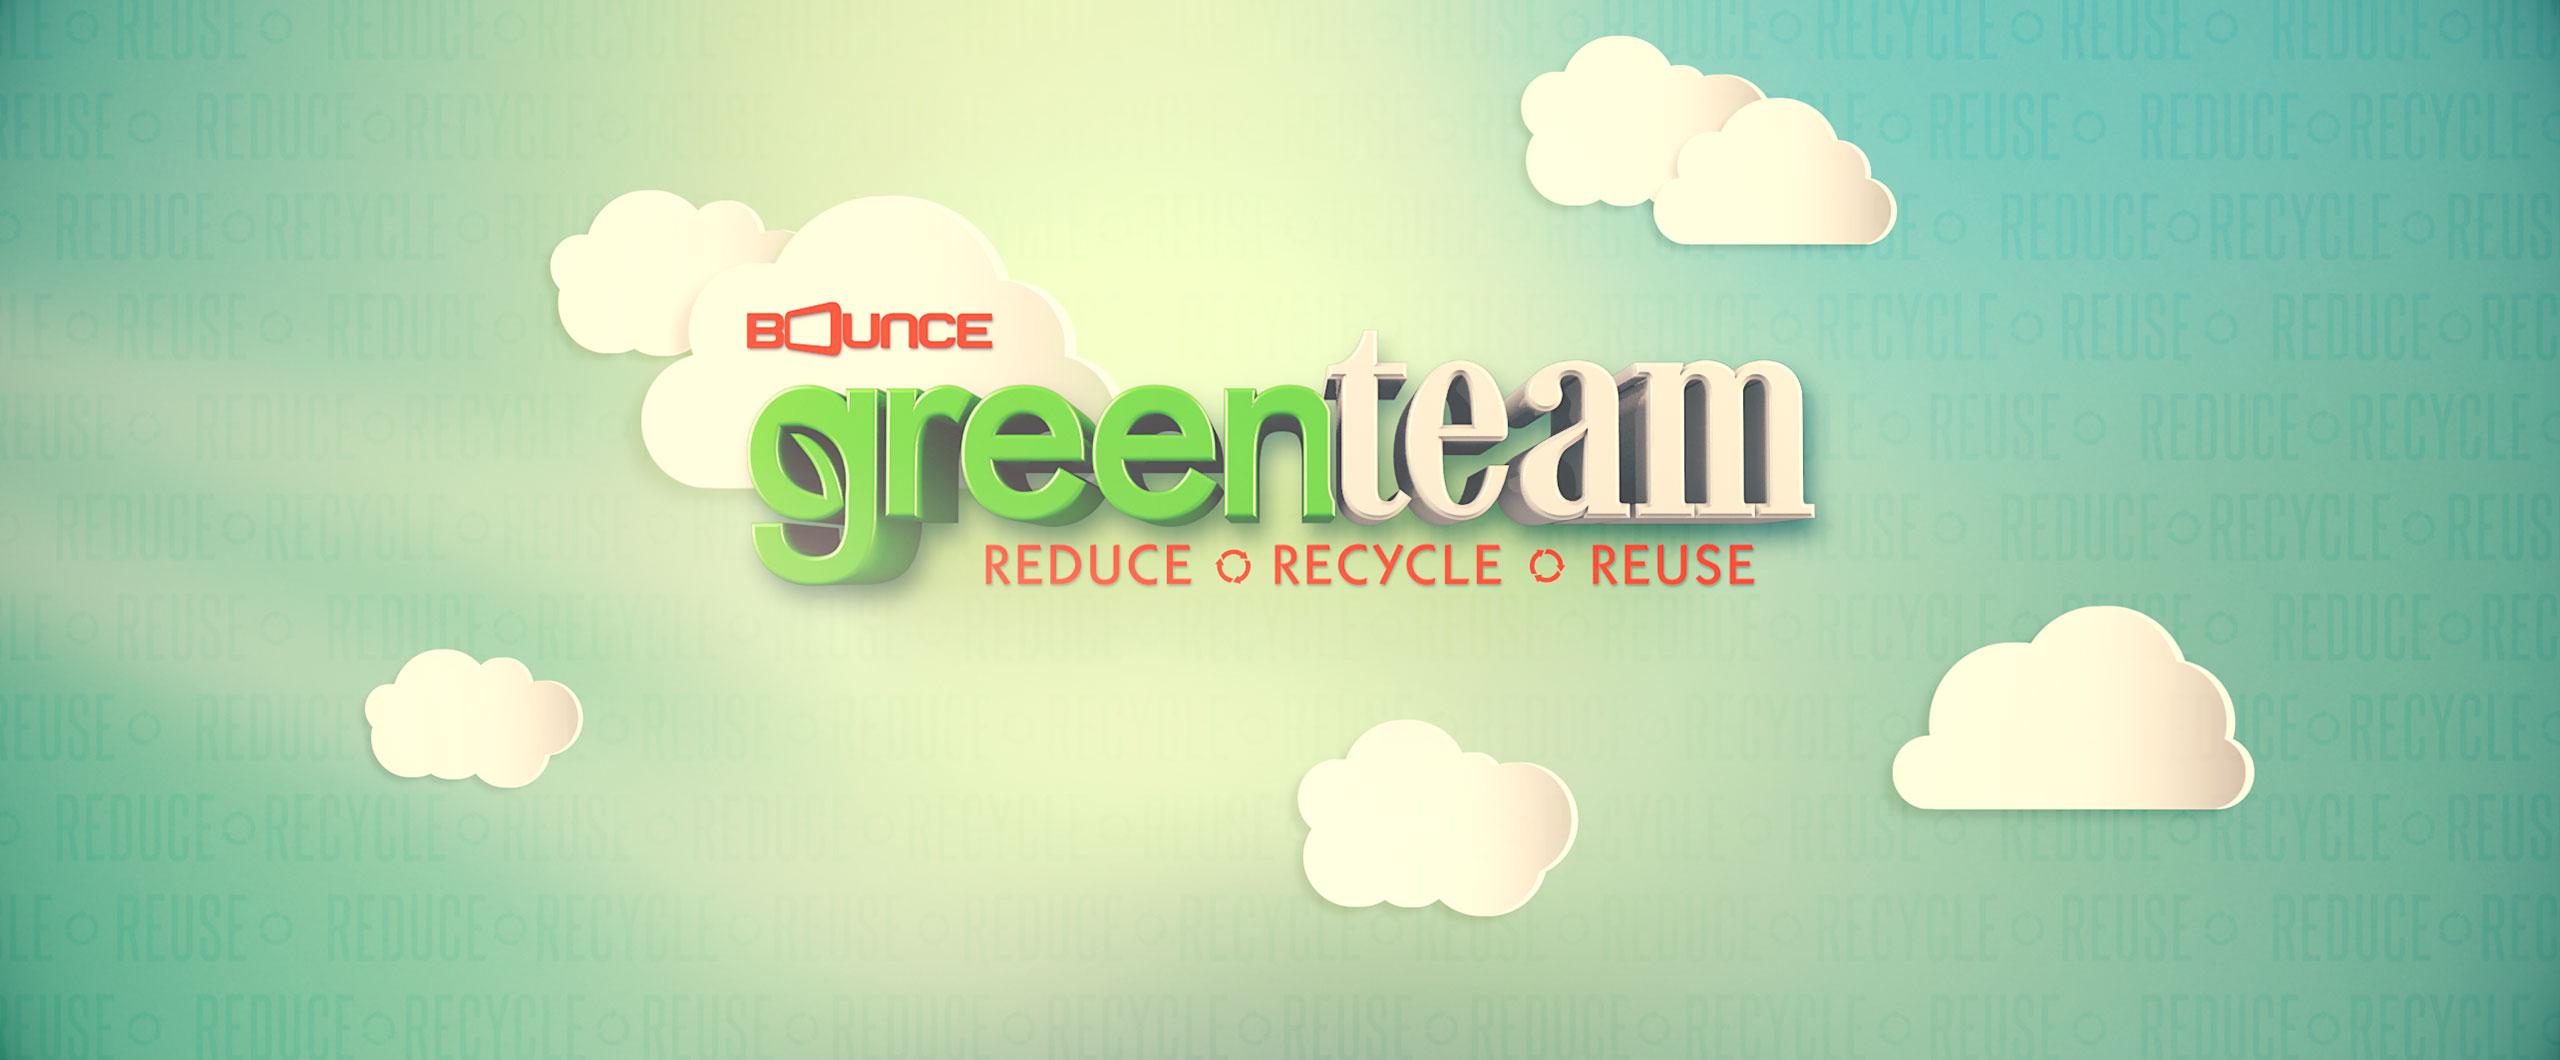 Green Team 2019